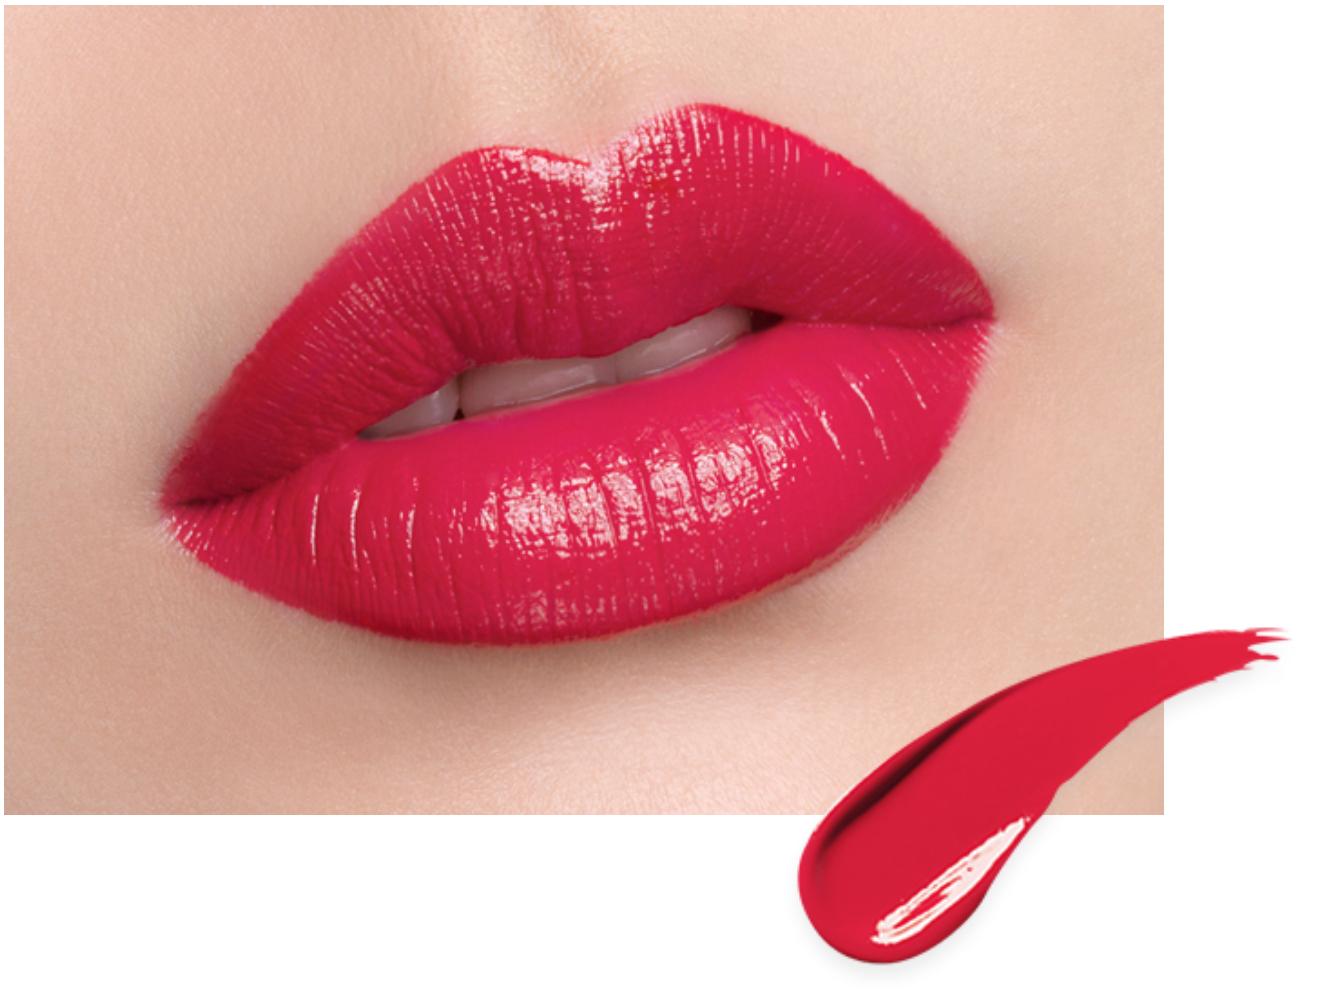 laneige-silk-intense-lipstick-314.png